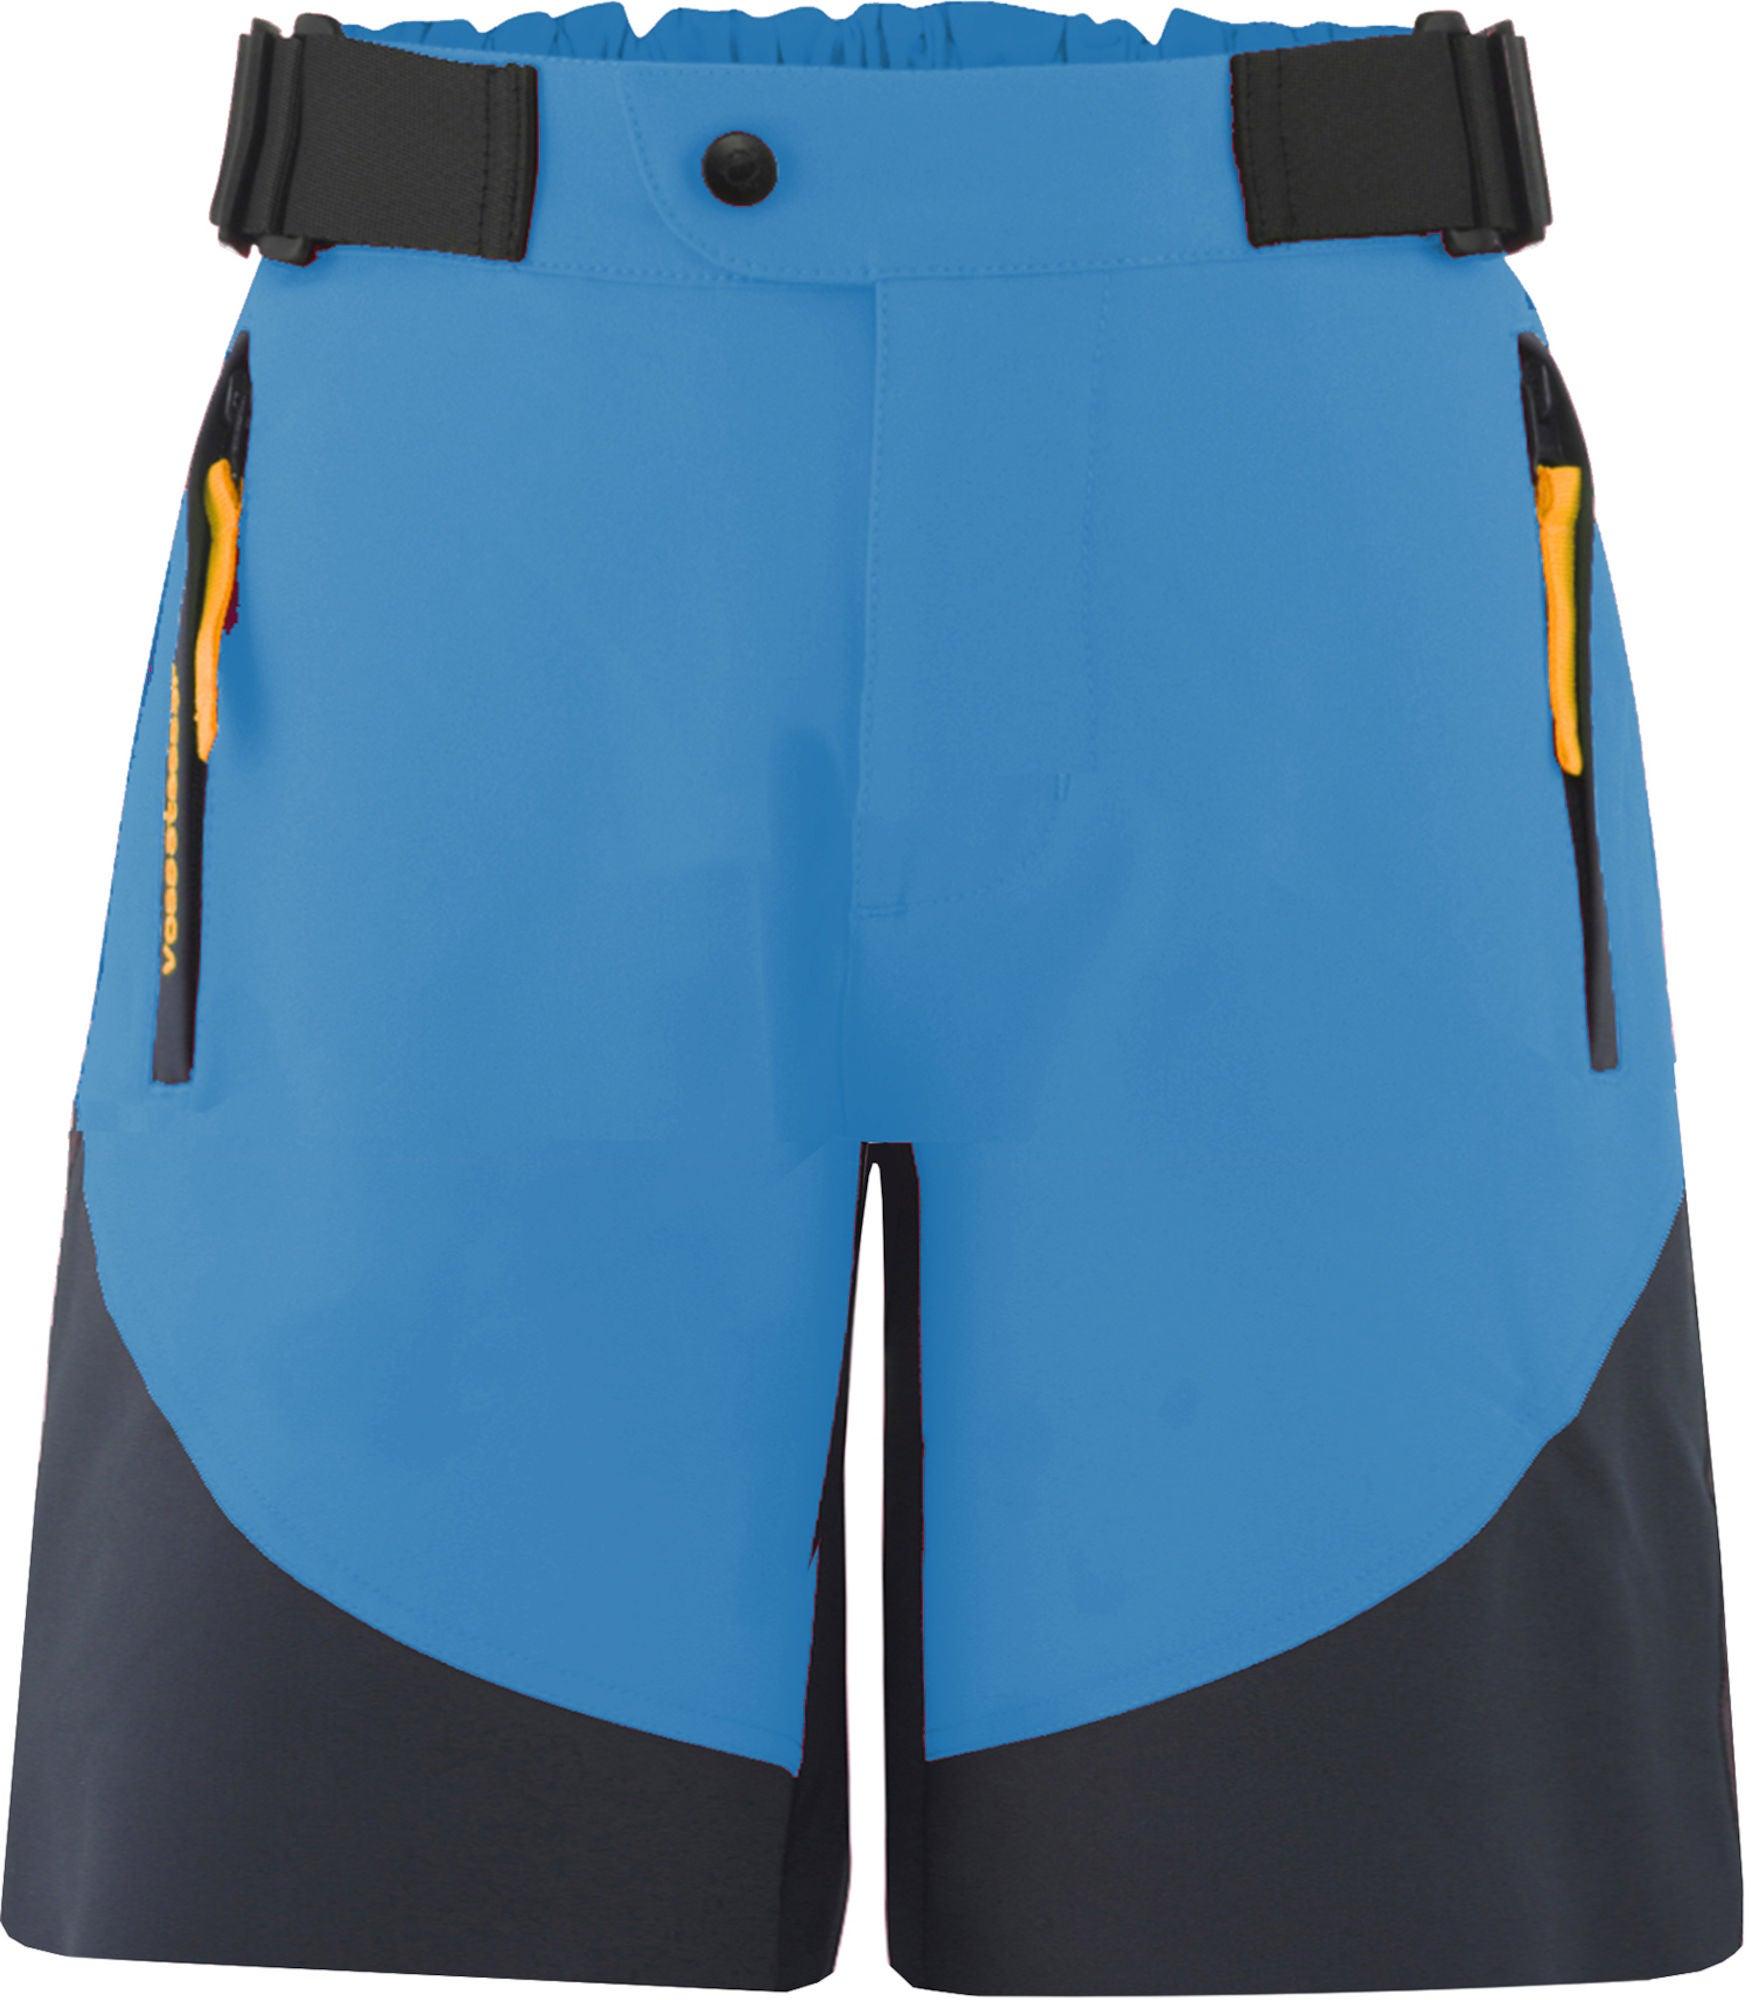 bd857a2b Köp Vossatassar Tur Shorts, LBlue | Jollyroom